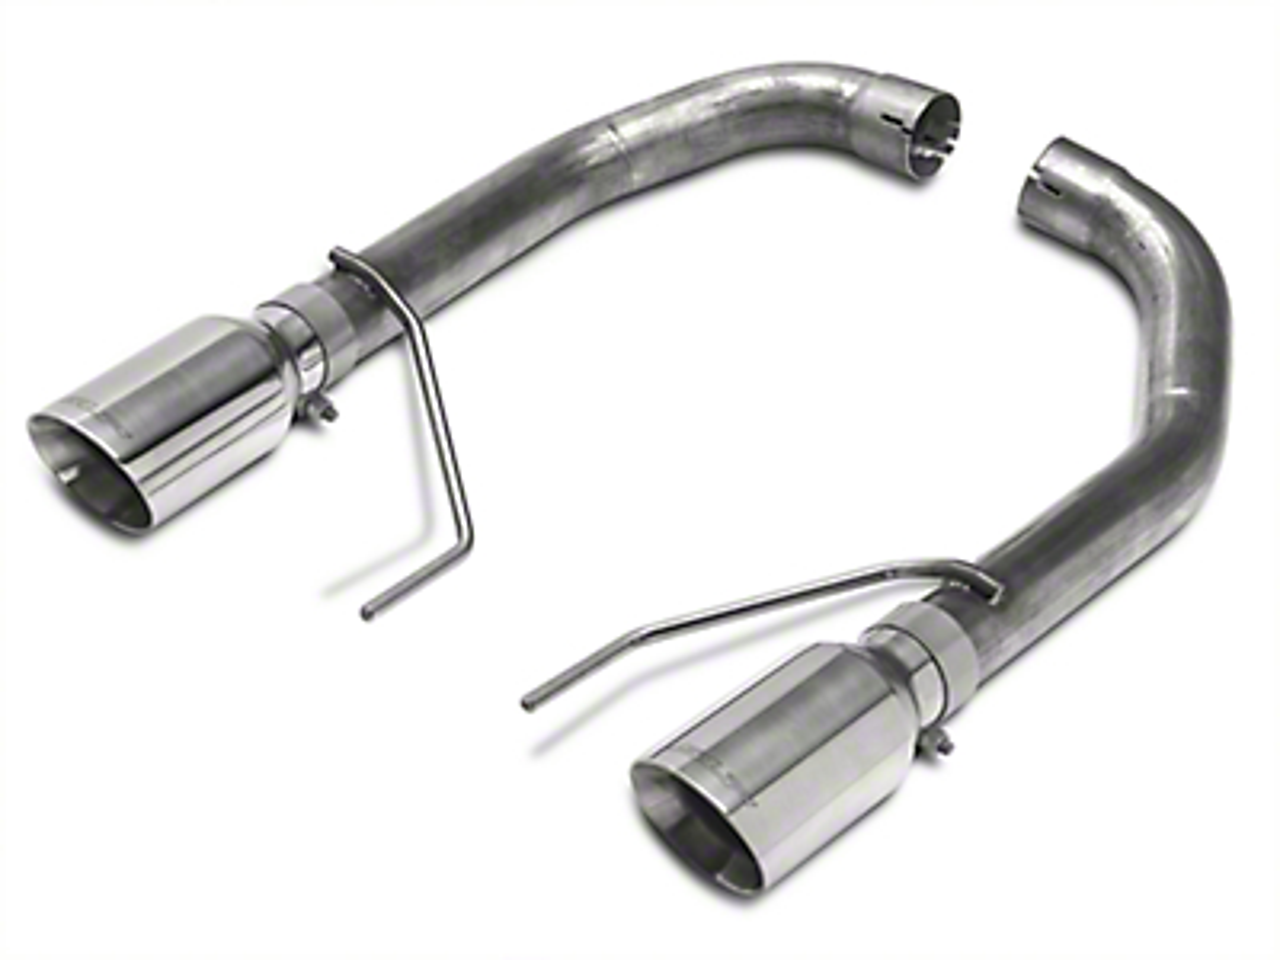 SLP Loudmouth Muffler Delete Axle-Back Exhaust (15-17 GT Fastback)